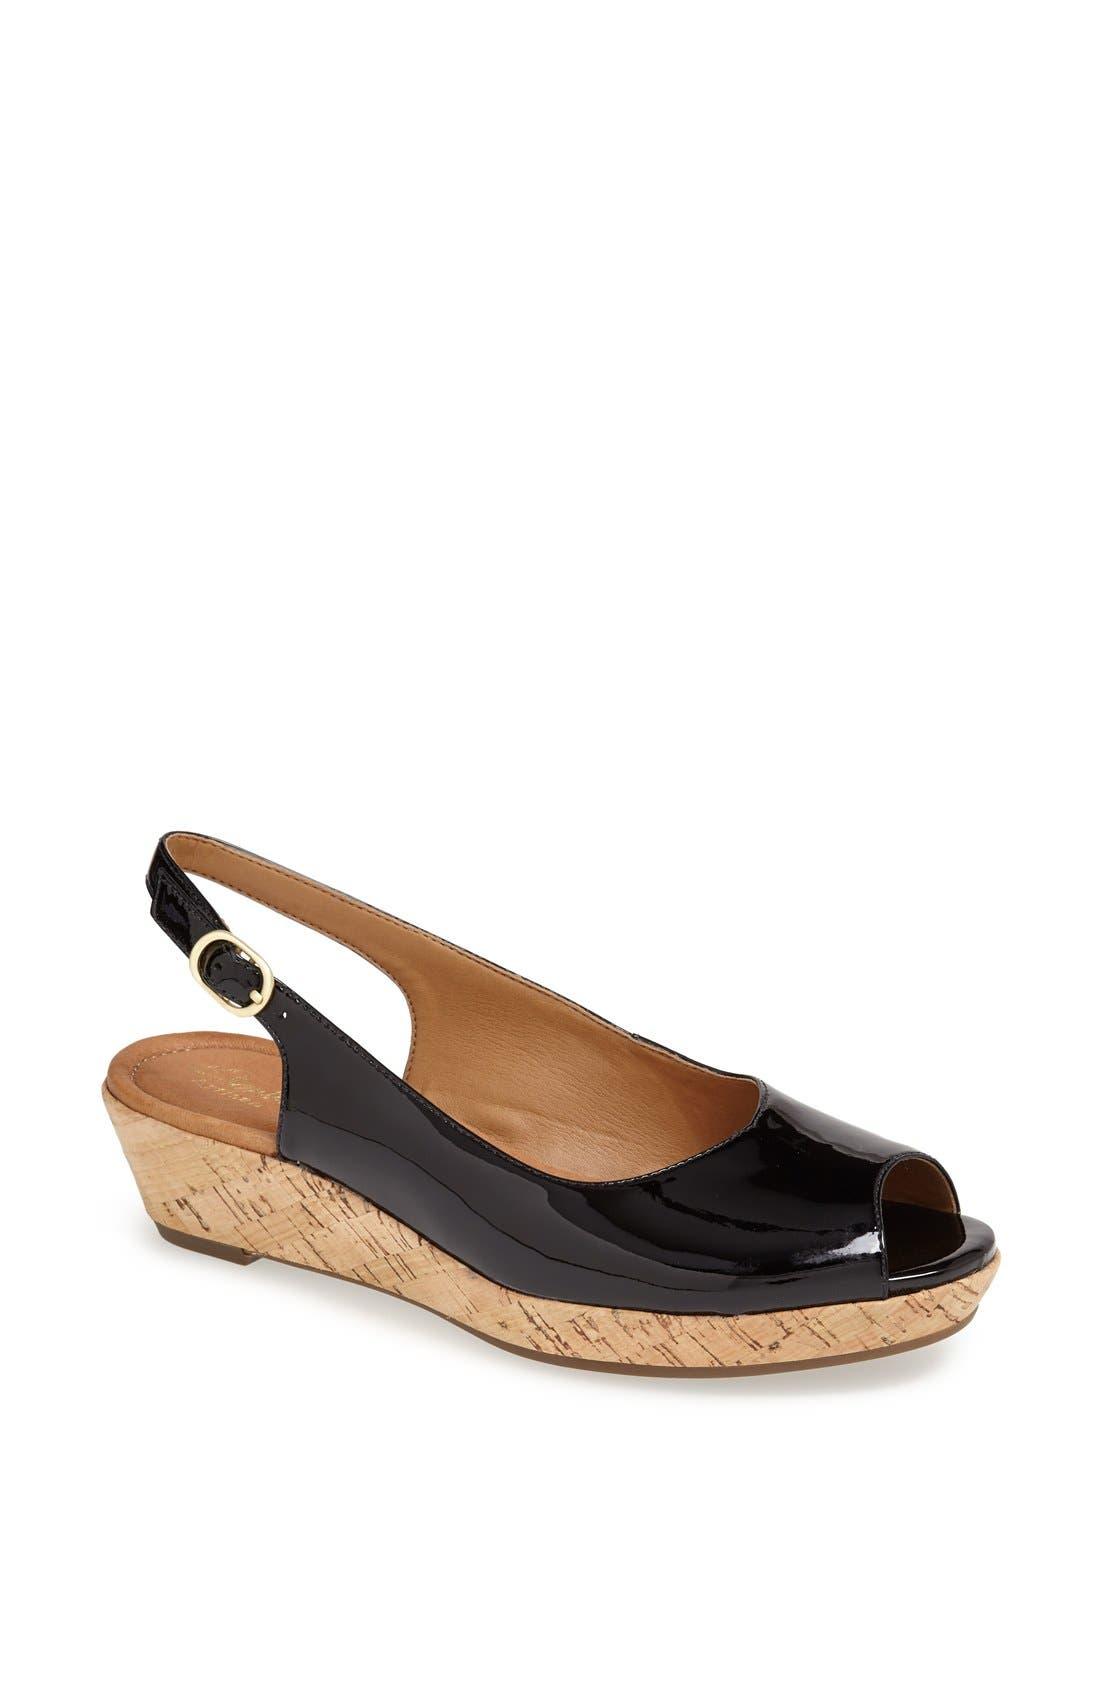 Alternate Image 1 Selected - Clarks® 'Orlena Currant' Sandal (Regular Retail Price: $99.95)